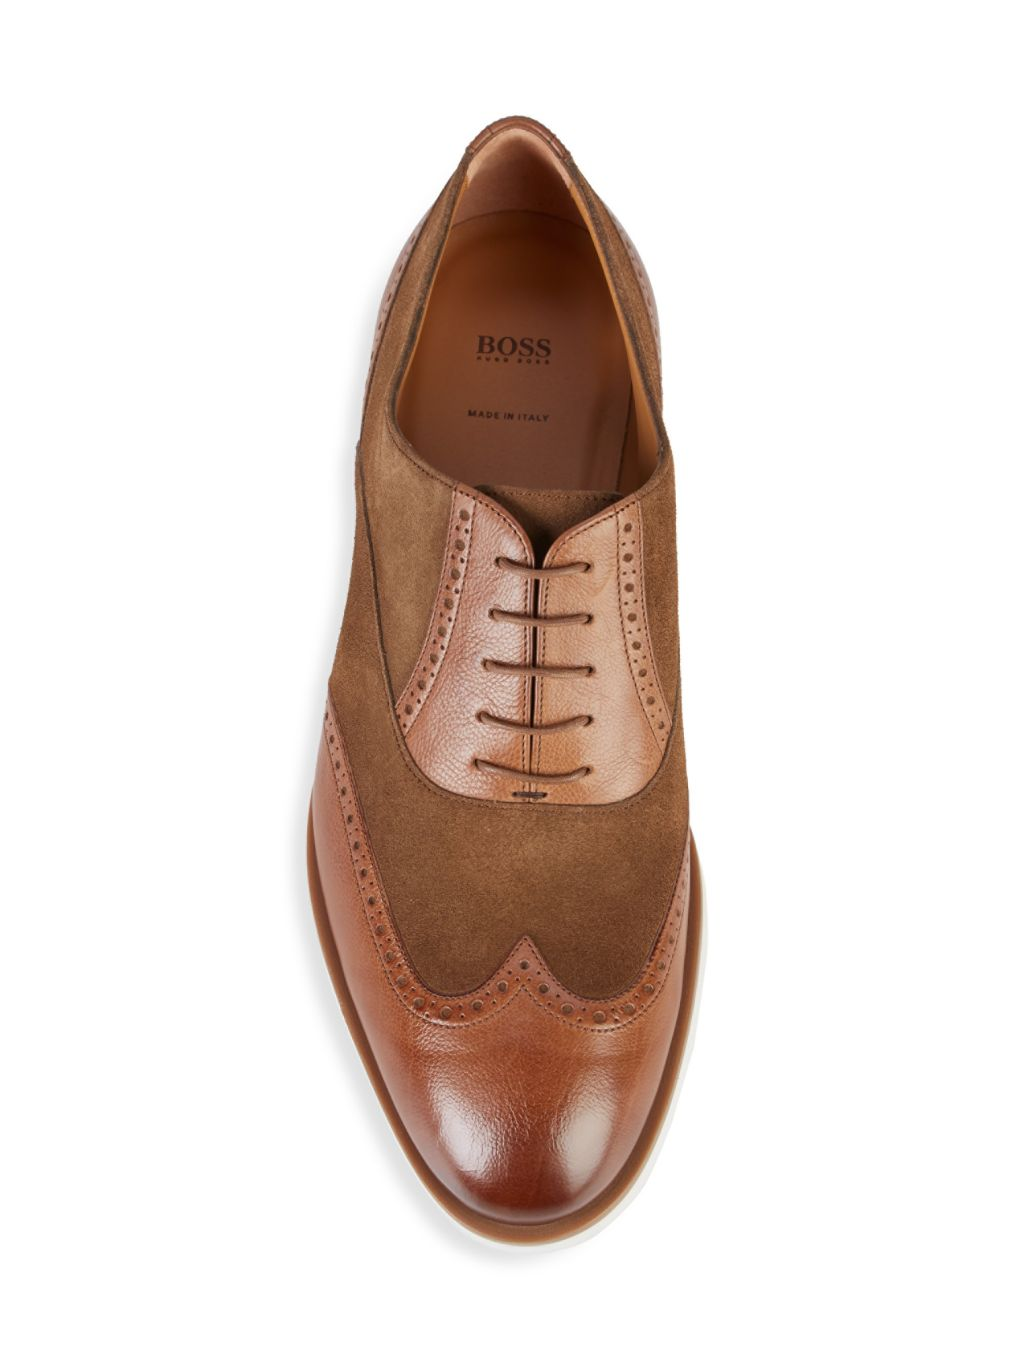 Boss Hugo Boss Eden Suede & Leather Derbies